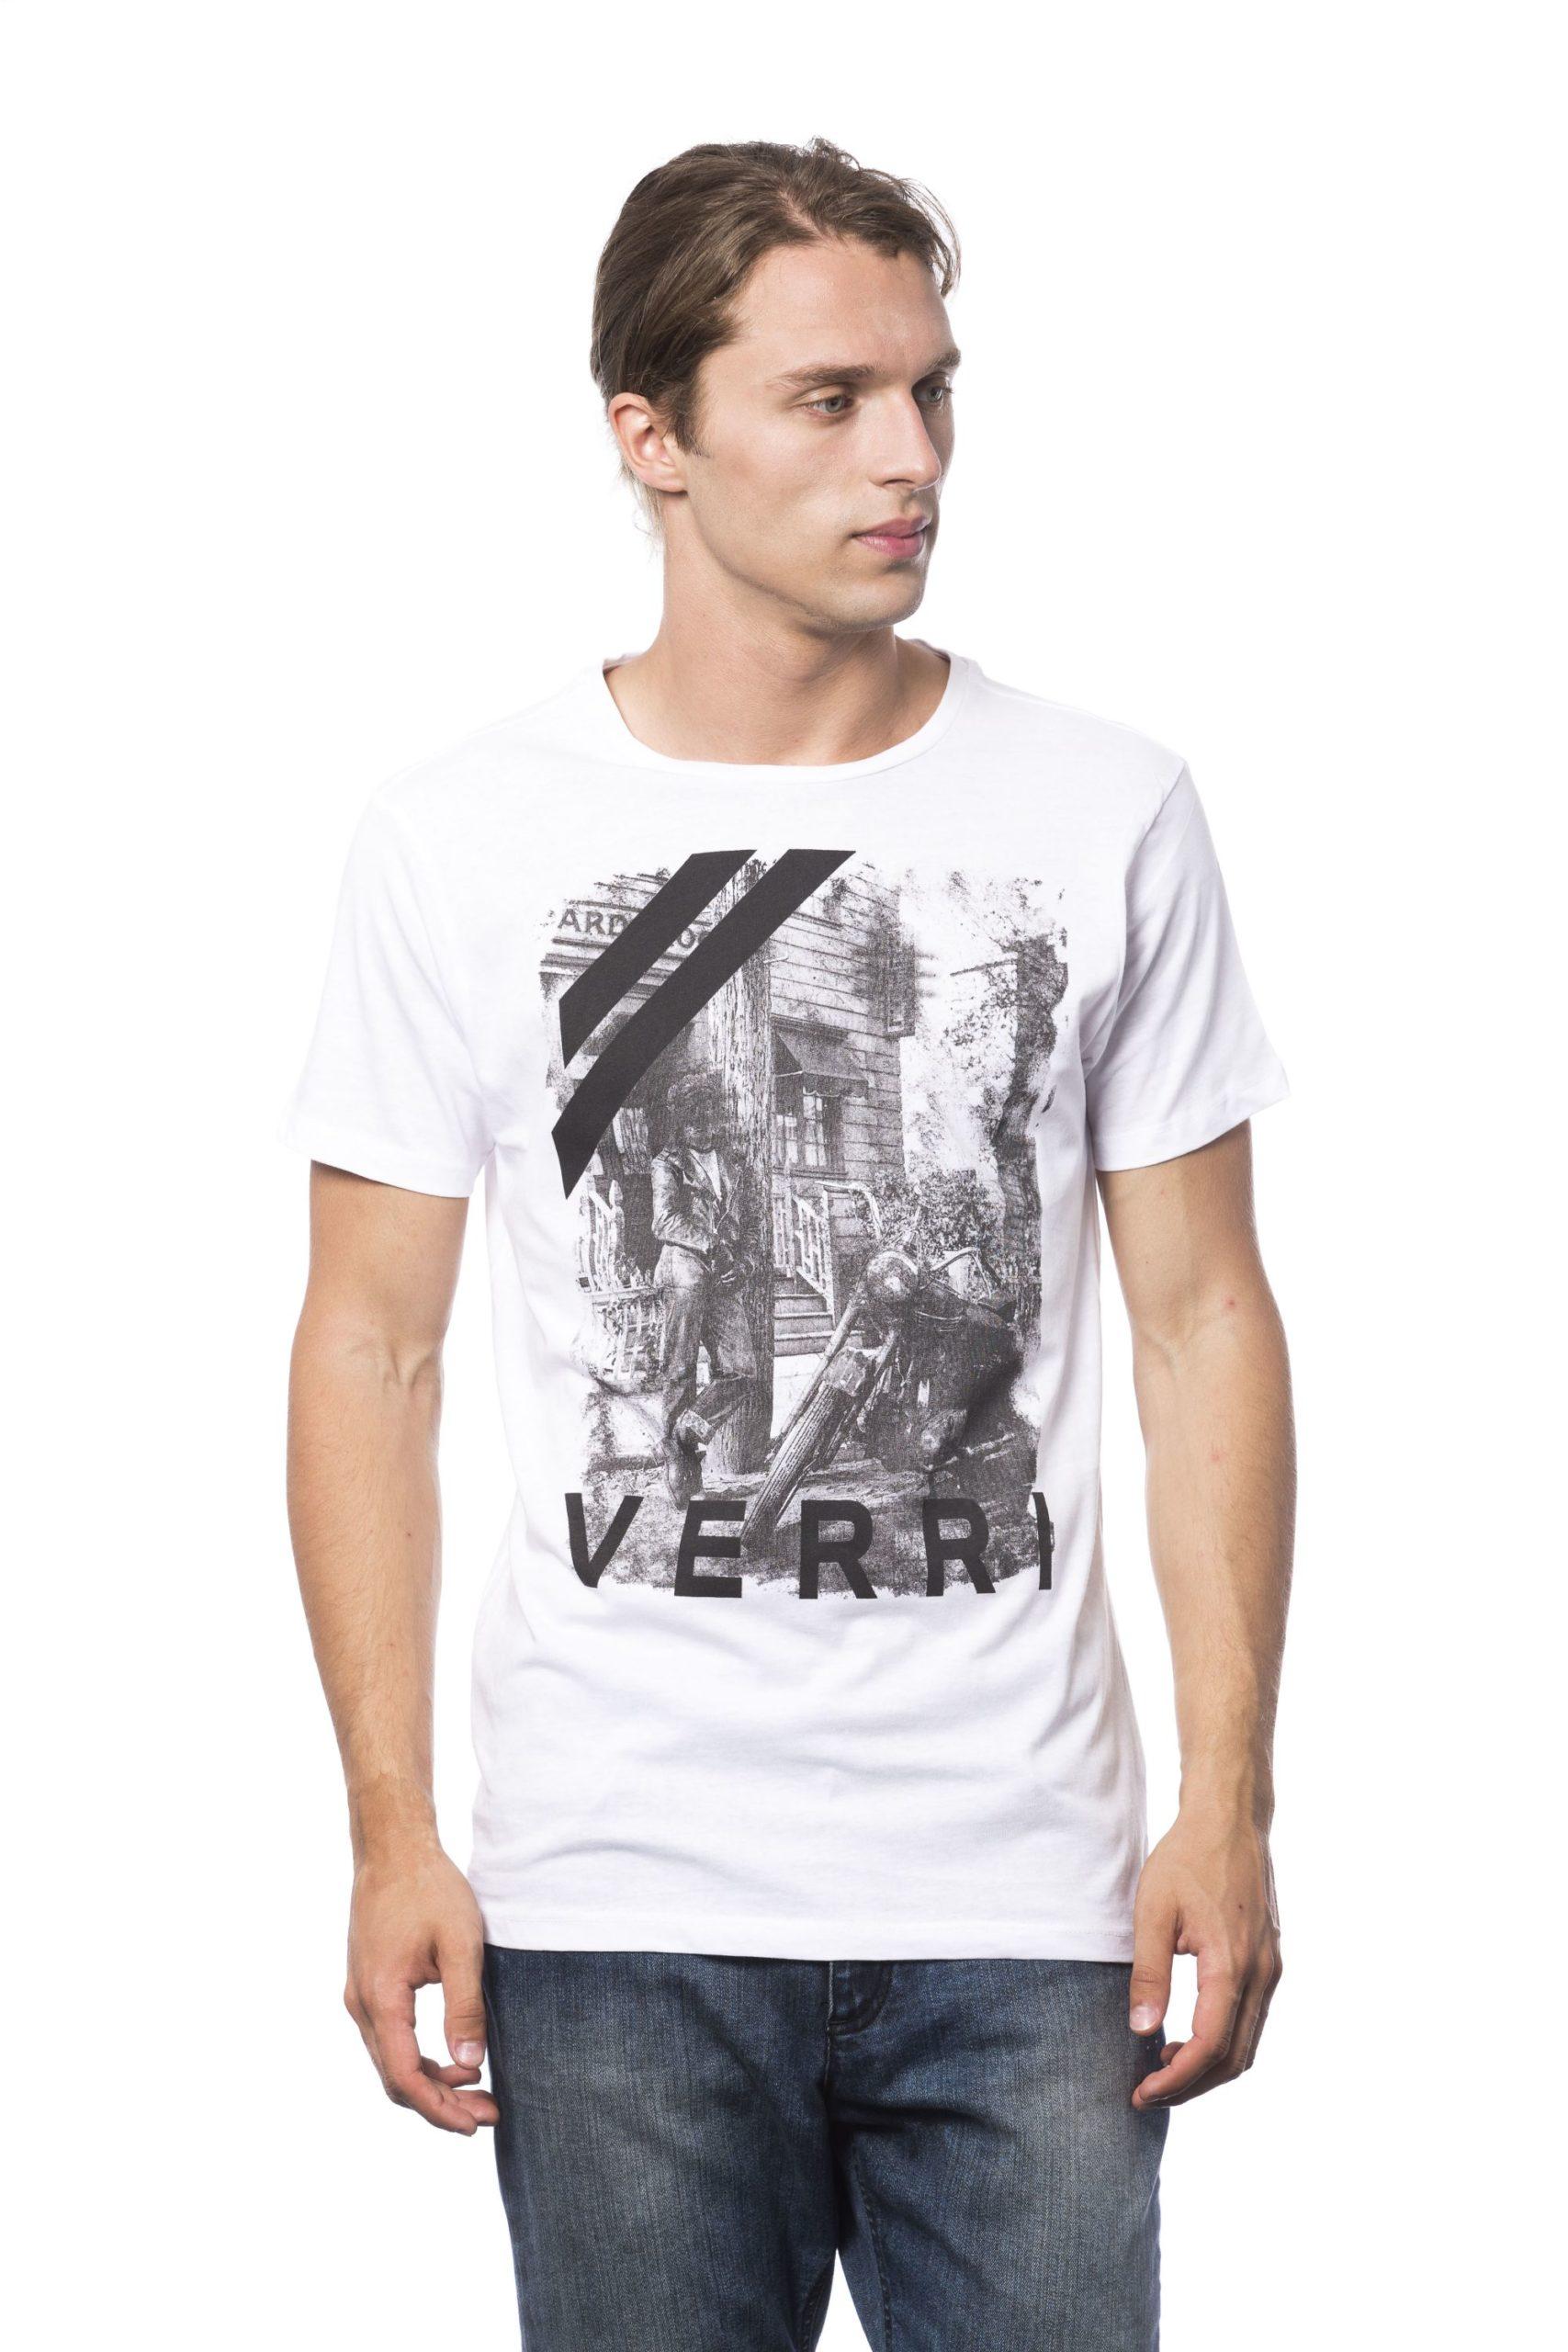 Verri Men's Bianco T-Shirt White VE686065 - S